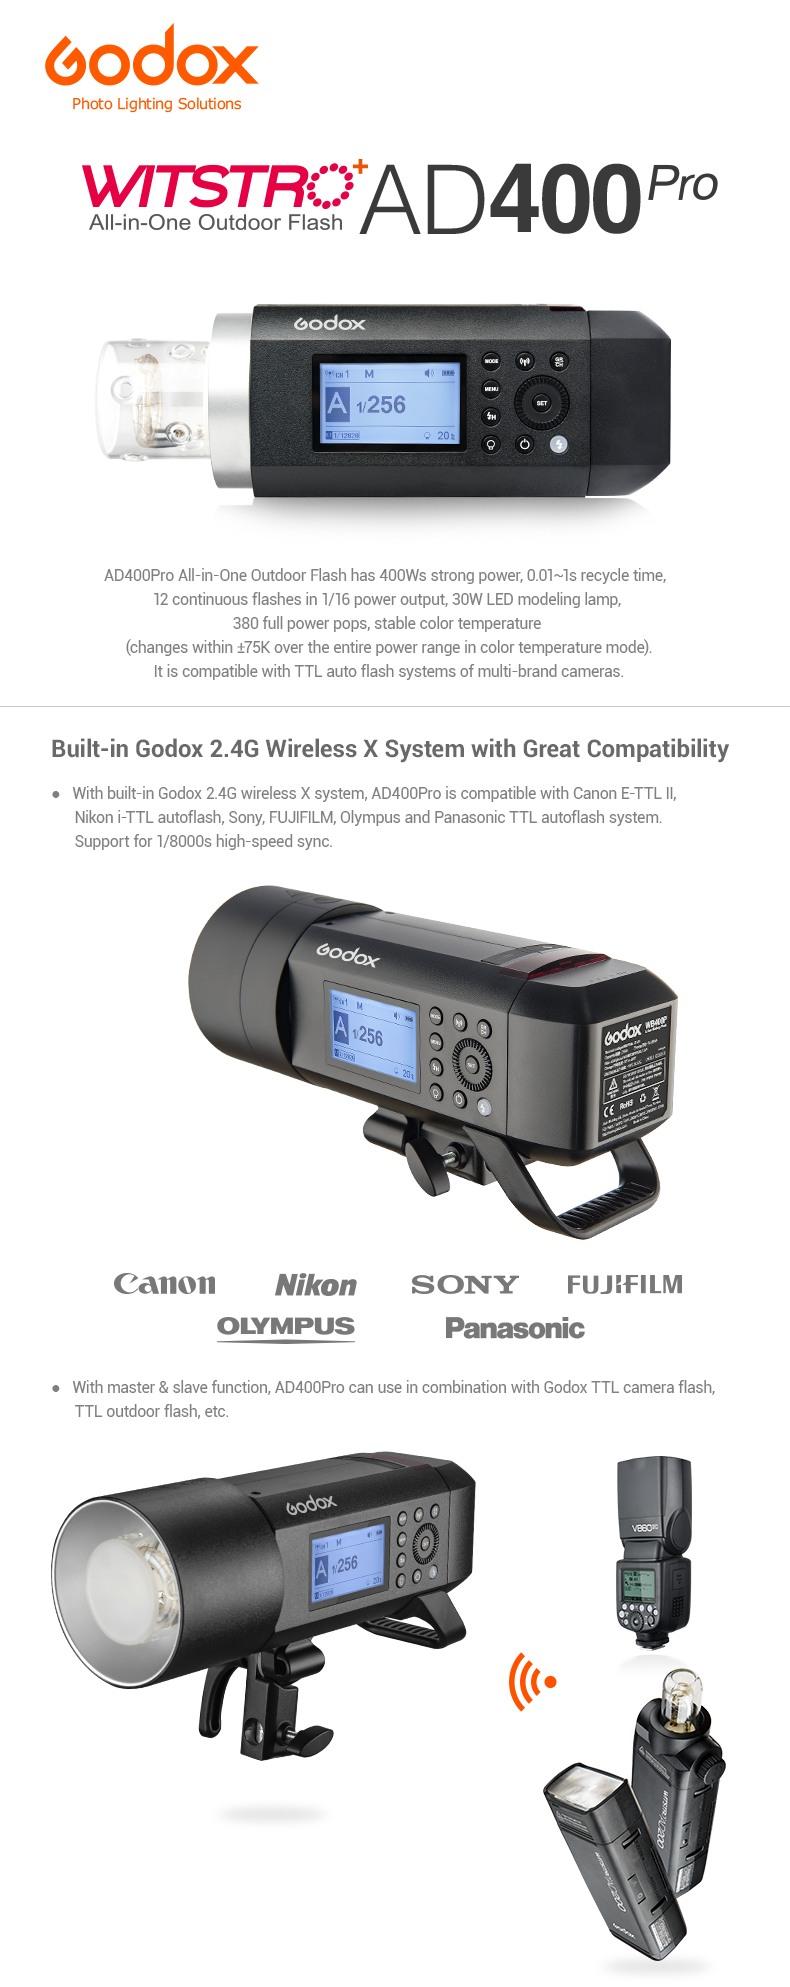 Godox Witstro AD400Pro All-in-One Outdoor Flash. Built-in Godox 2.4G Wireless X system. High compability - Canon, Nikon, Sony, Fuji, Olympus, Panasonic.